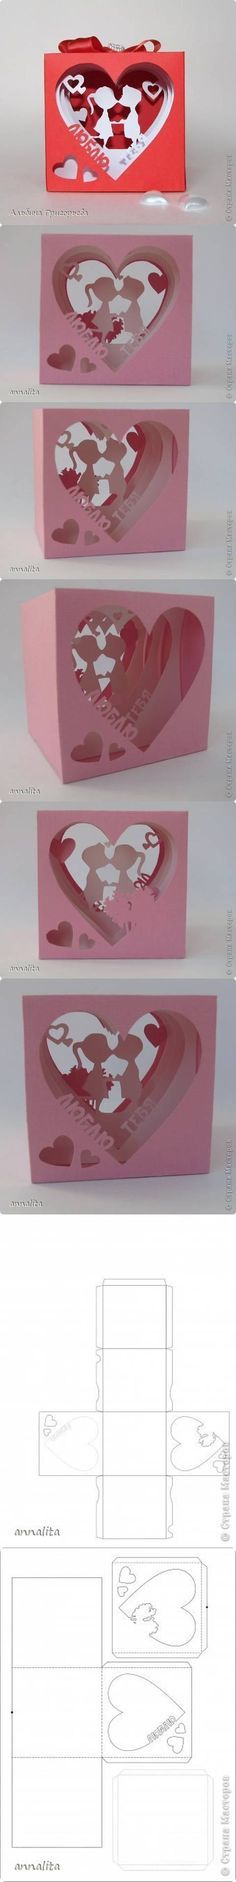 Caja corazón para San Valentín   -  DIY Valentines Heart Box